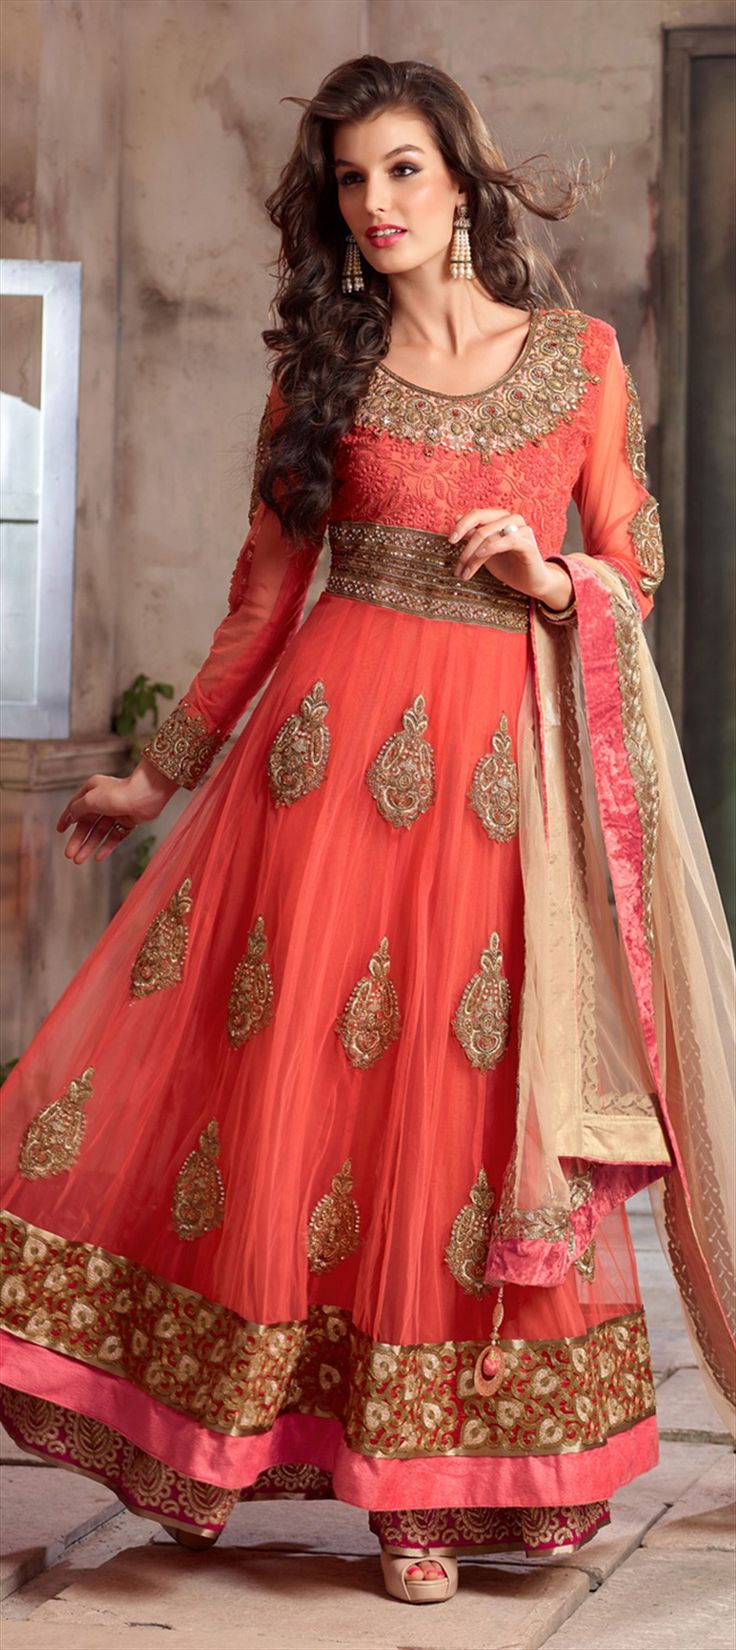 420540: Orange color family semi-stiched Anarkali Suits.